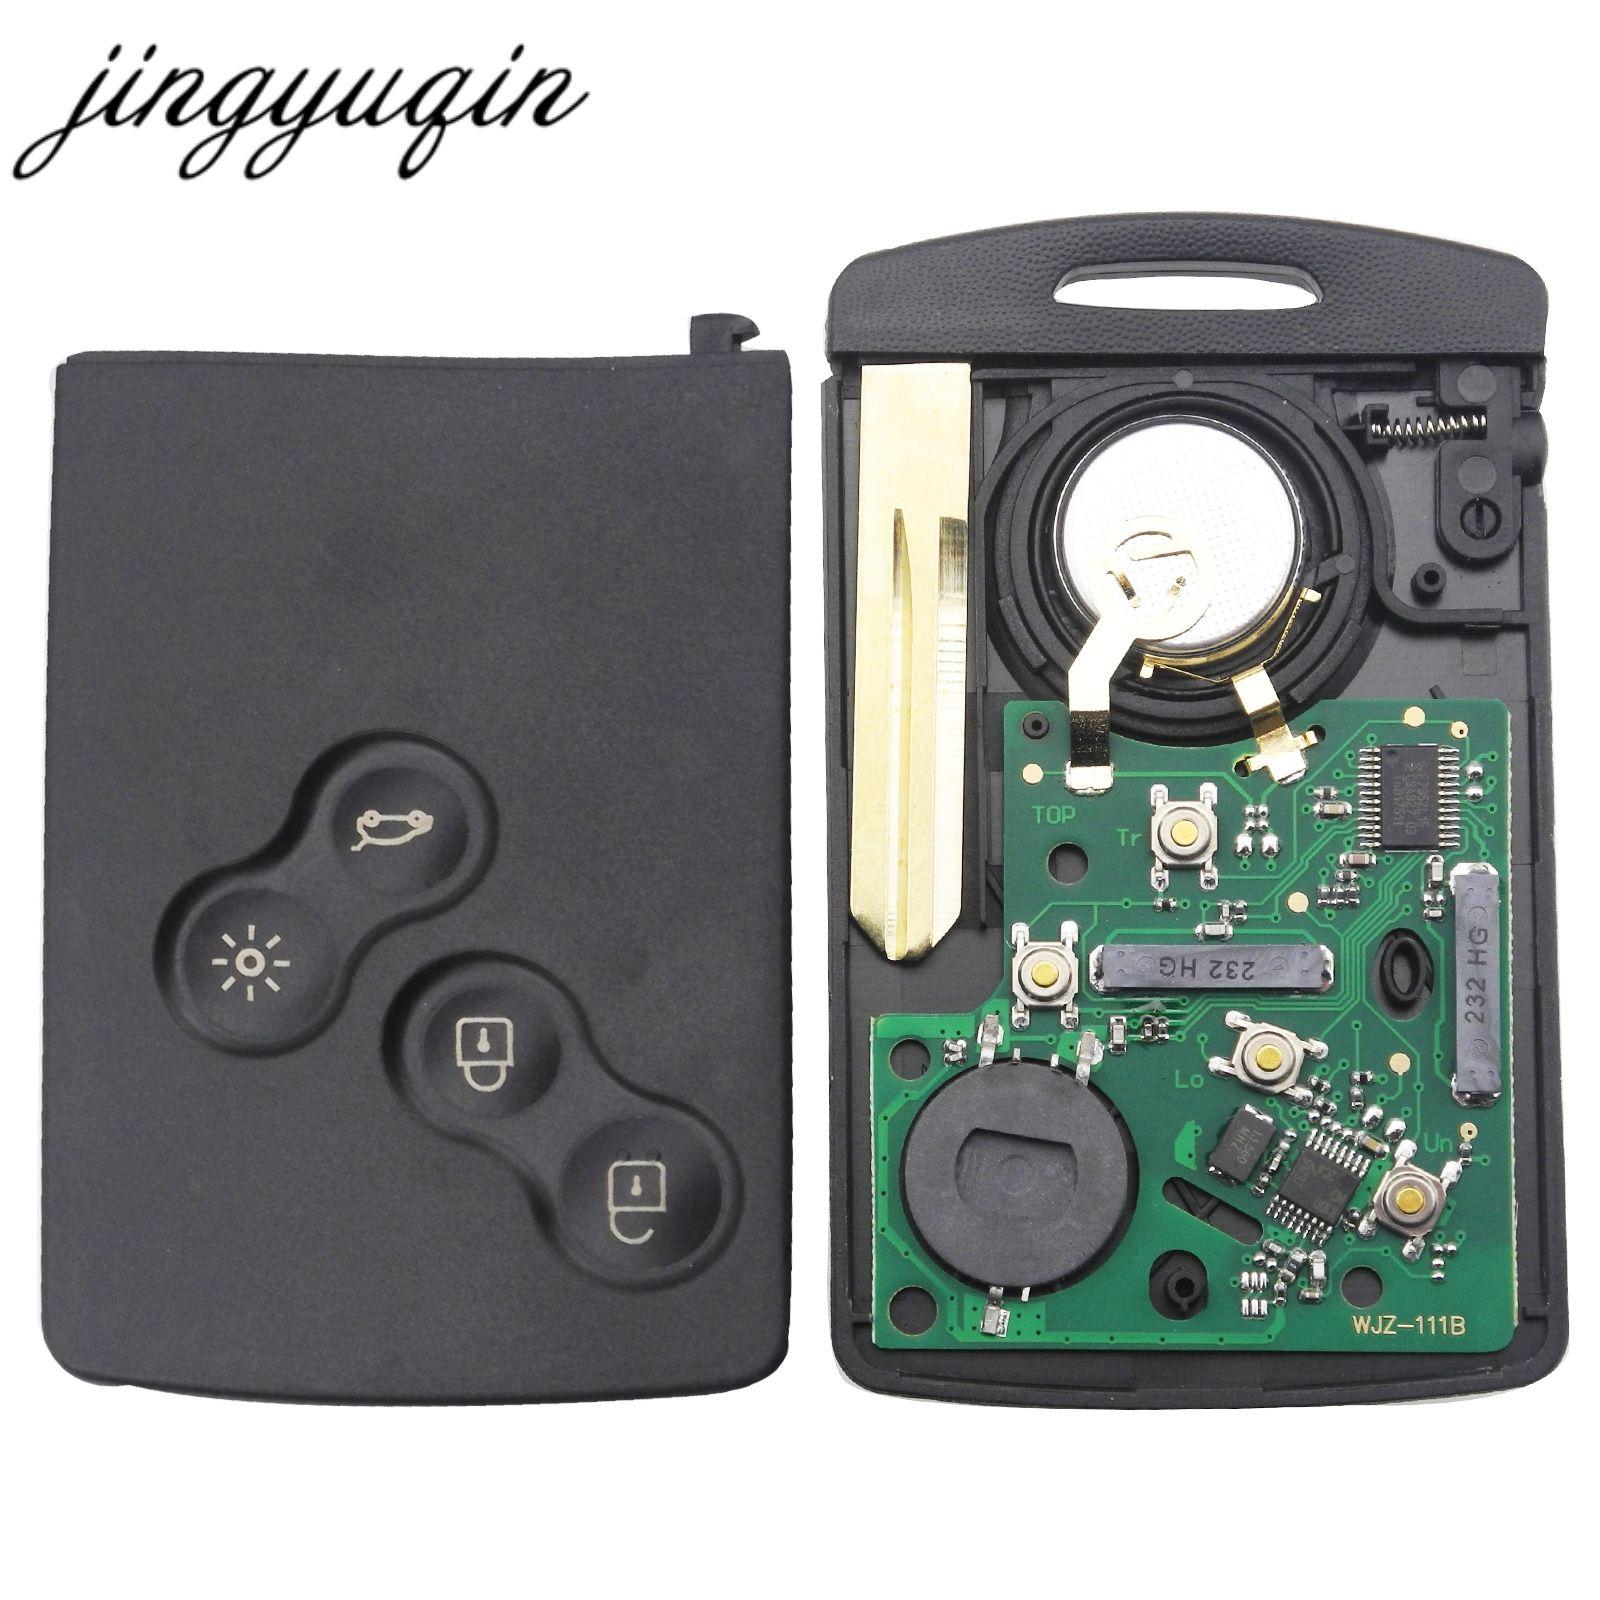 Jingyuqin Auto Schlüssel Karte Fob 433 mhz PCF7952 Chip für Renault Megane Scenic Laguna Koleos Clio Uncut Klinge 4 Taste remote Key